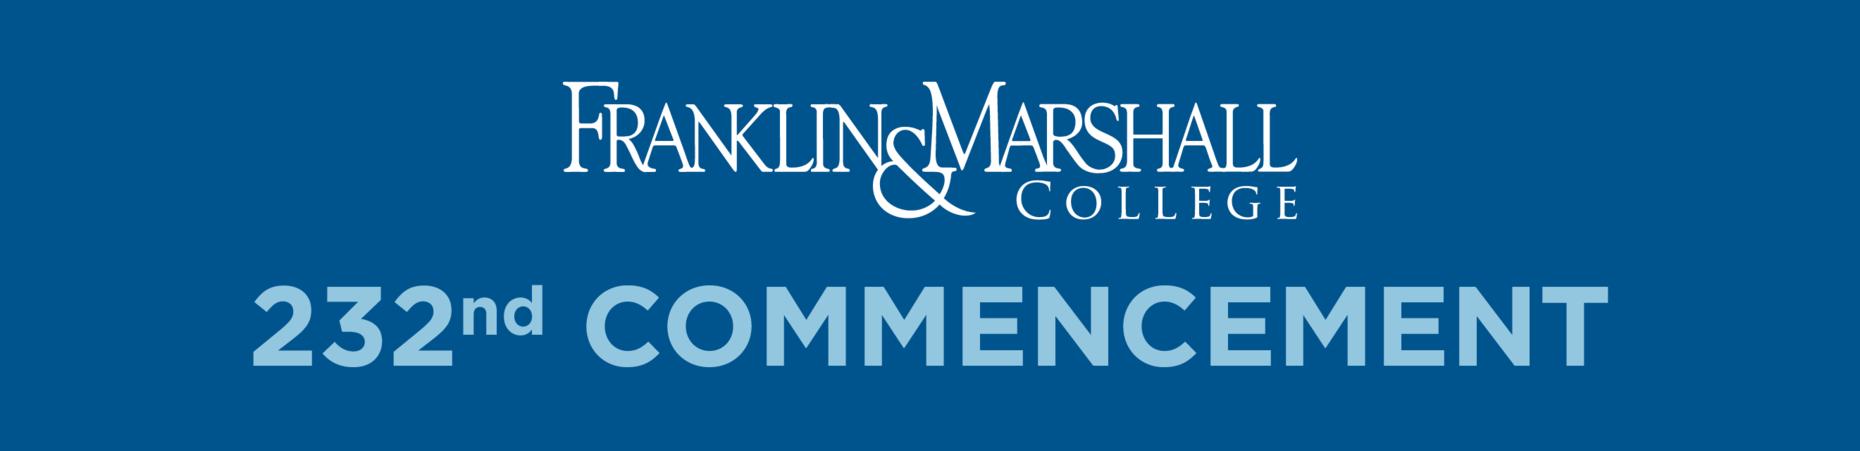 Franklin & Marshall – Commencement 2019 F&m Academic Calendar 2019